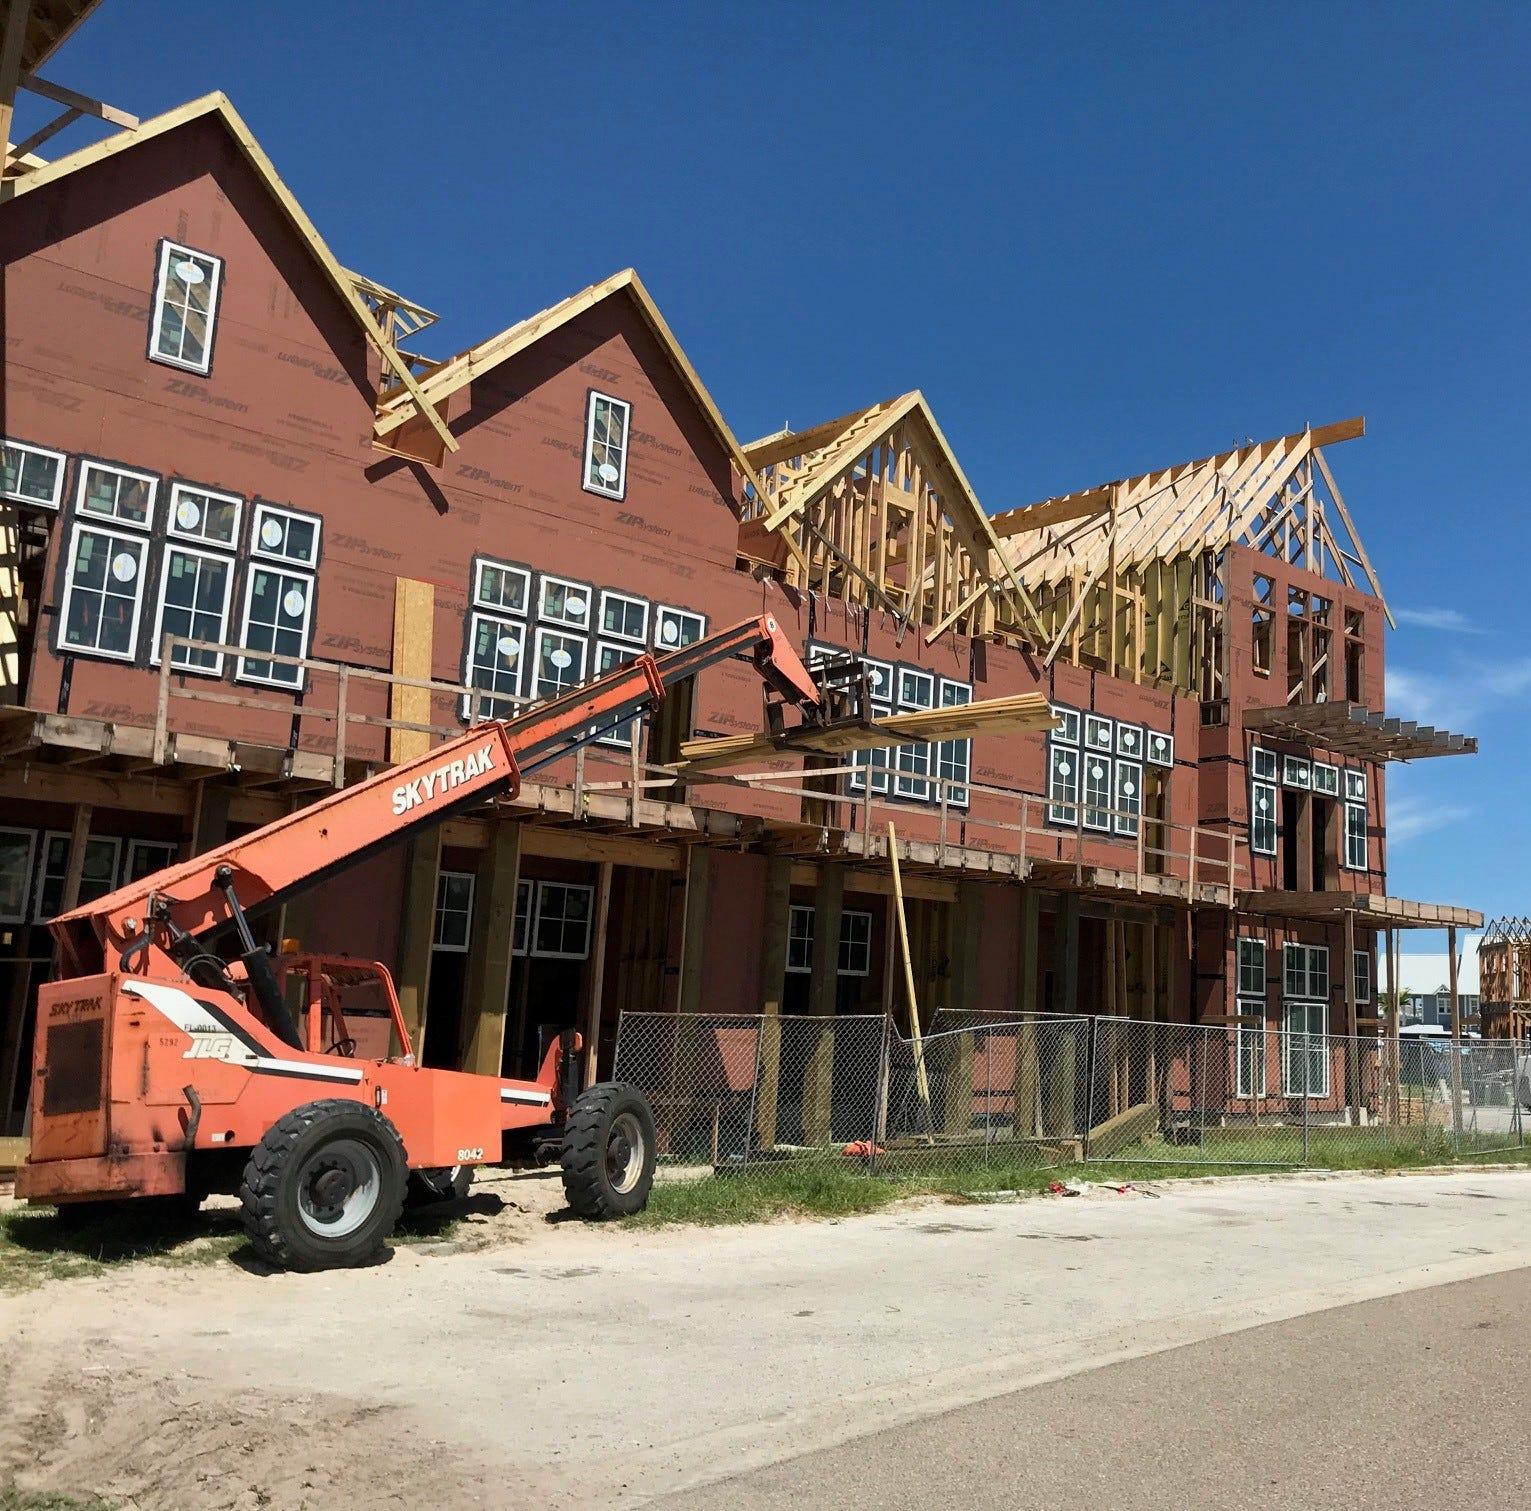 Hurricane Harvey, 1 year later: Rebuilding homes, rebuilding businesses, rebuilding lives